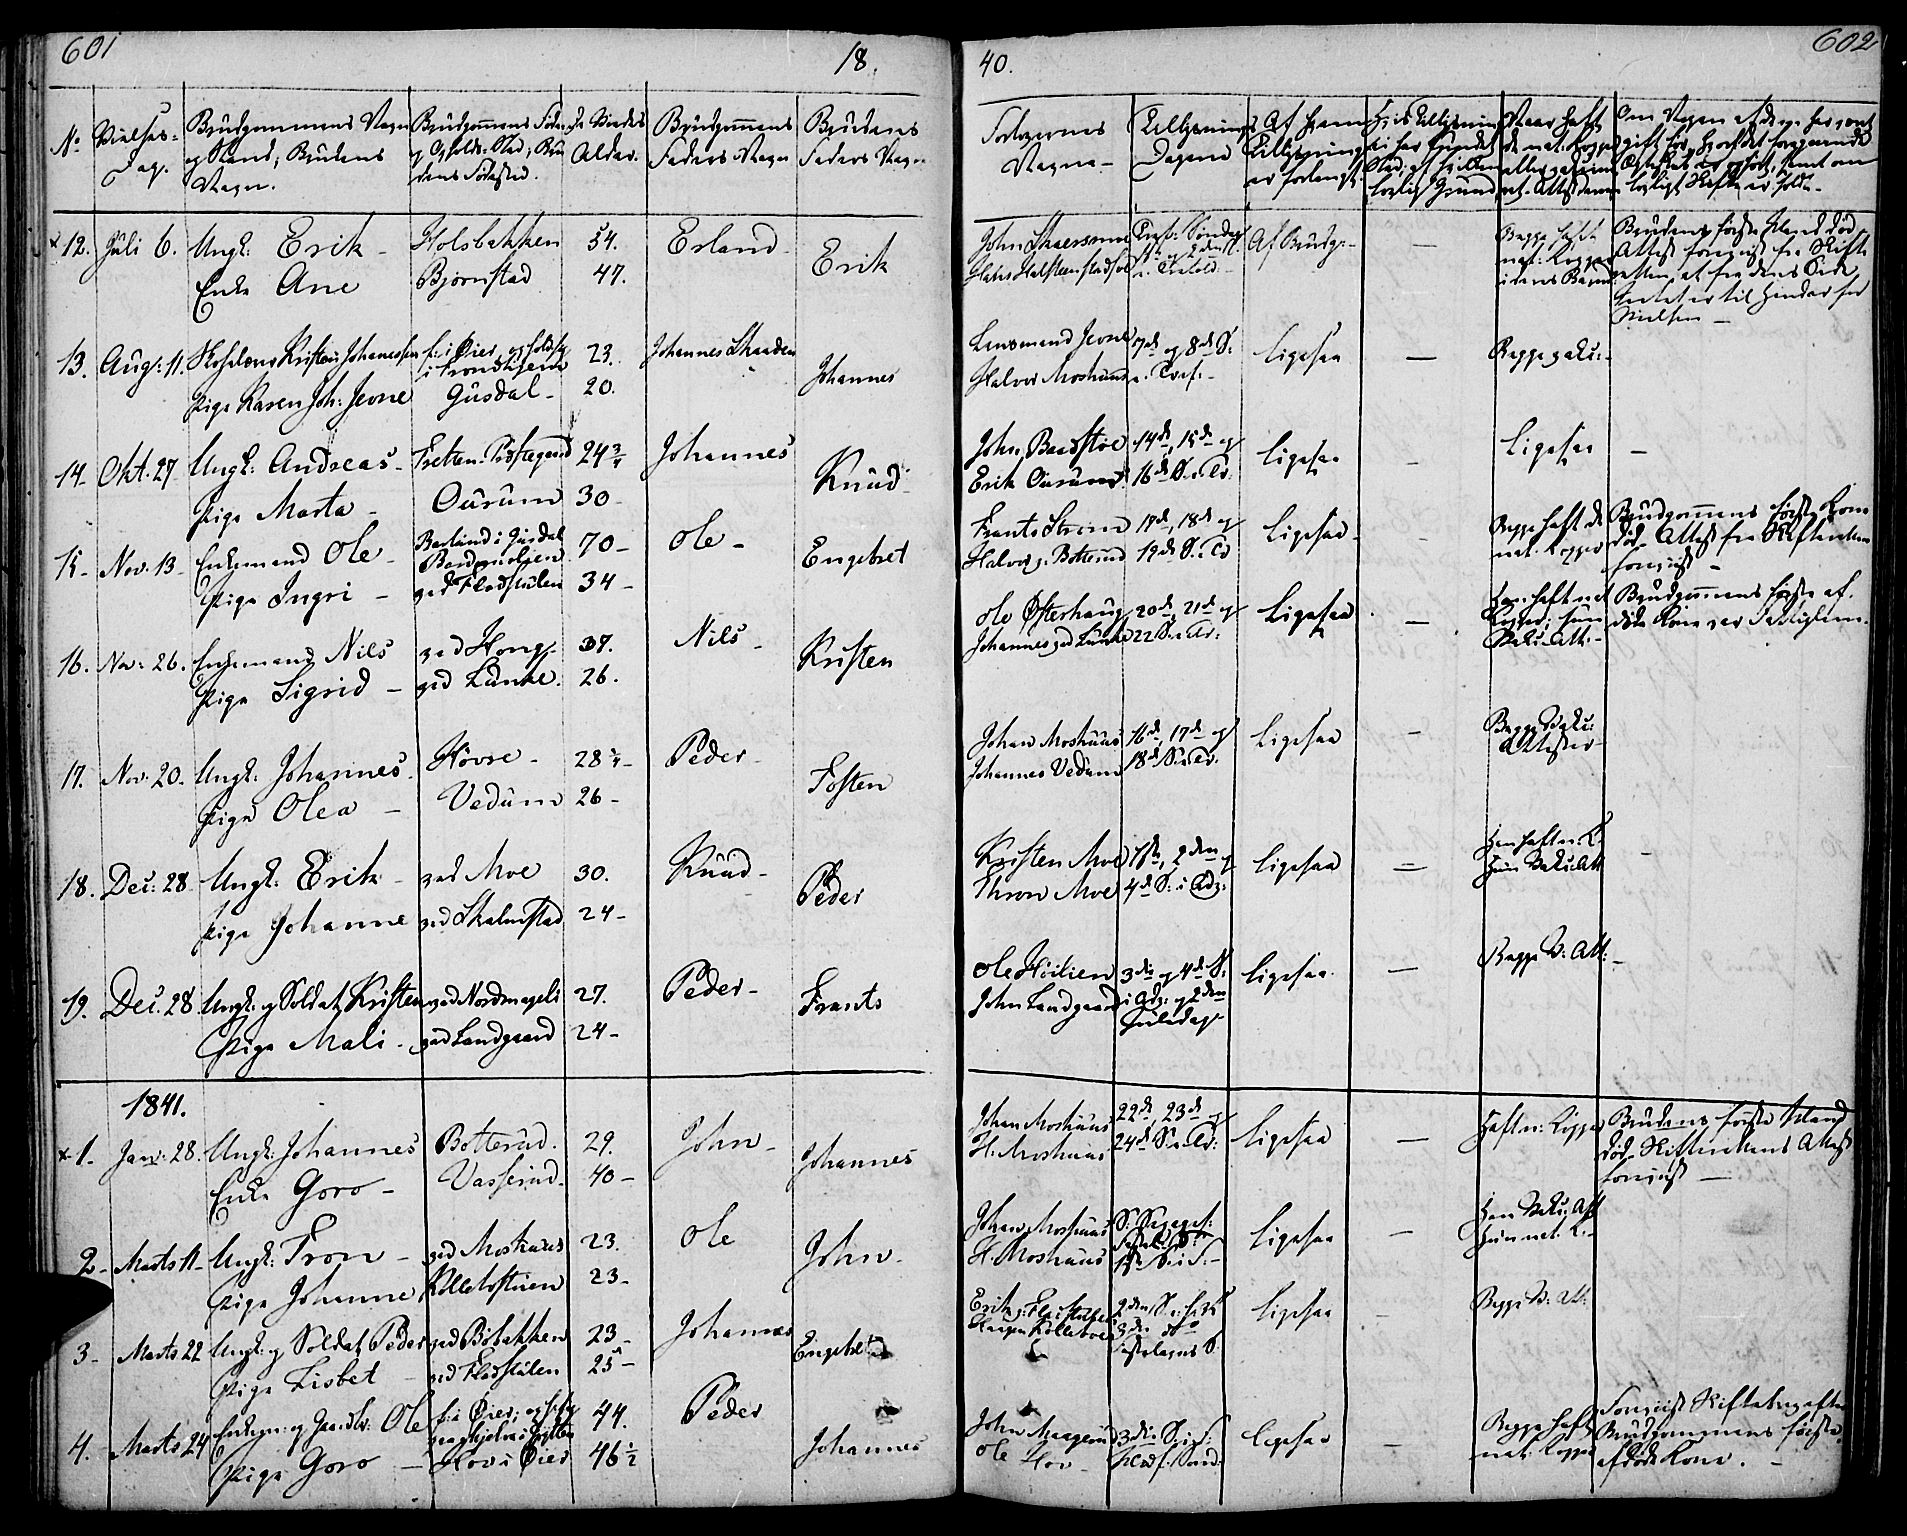 SAH, Øyer prestekontor, Ministerialbok nr. 4, 1824-1841, s. 601-602